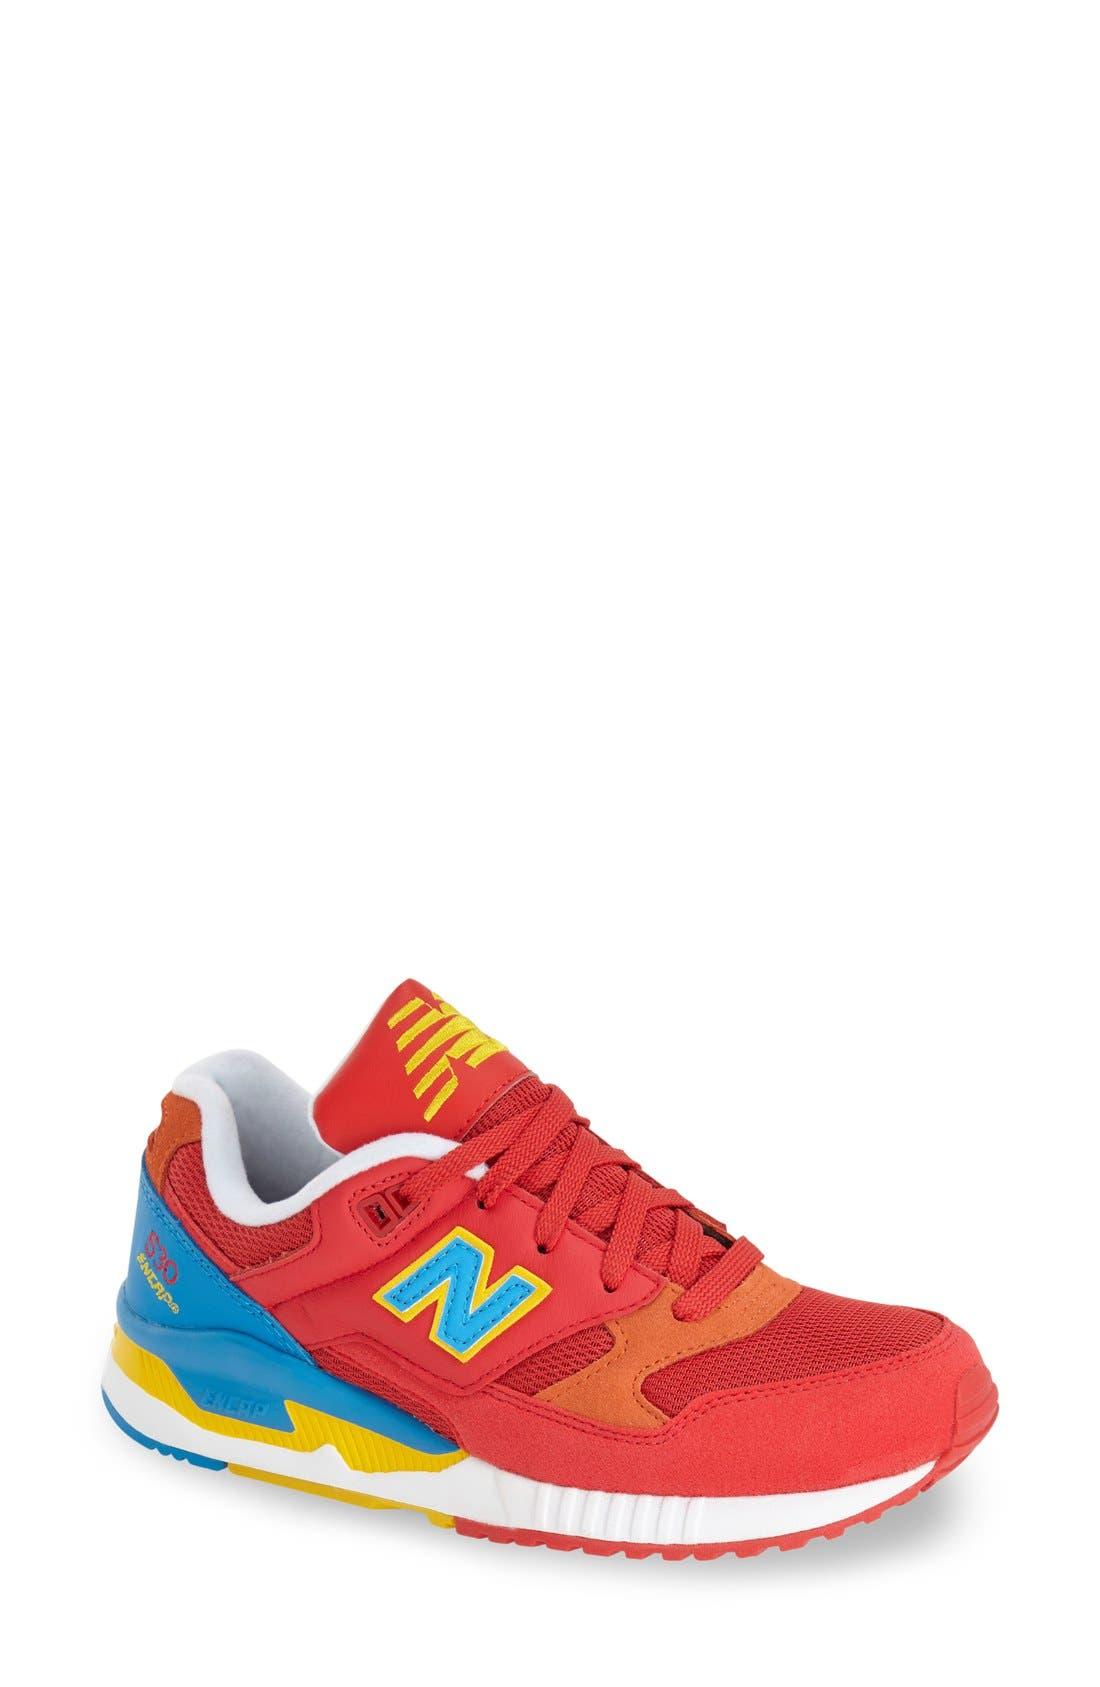 Main Image - New Balance '530' Sneaker (Women)